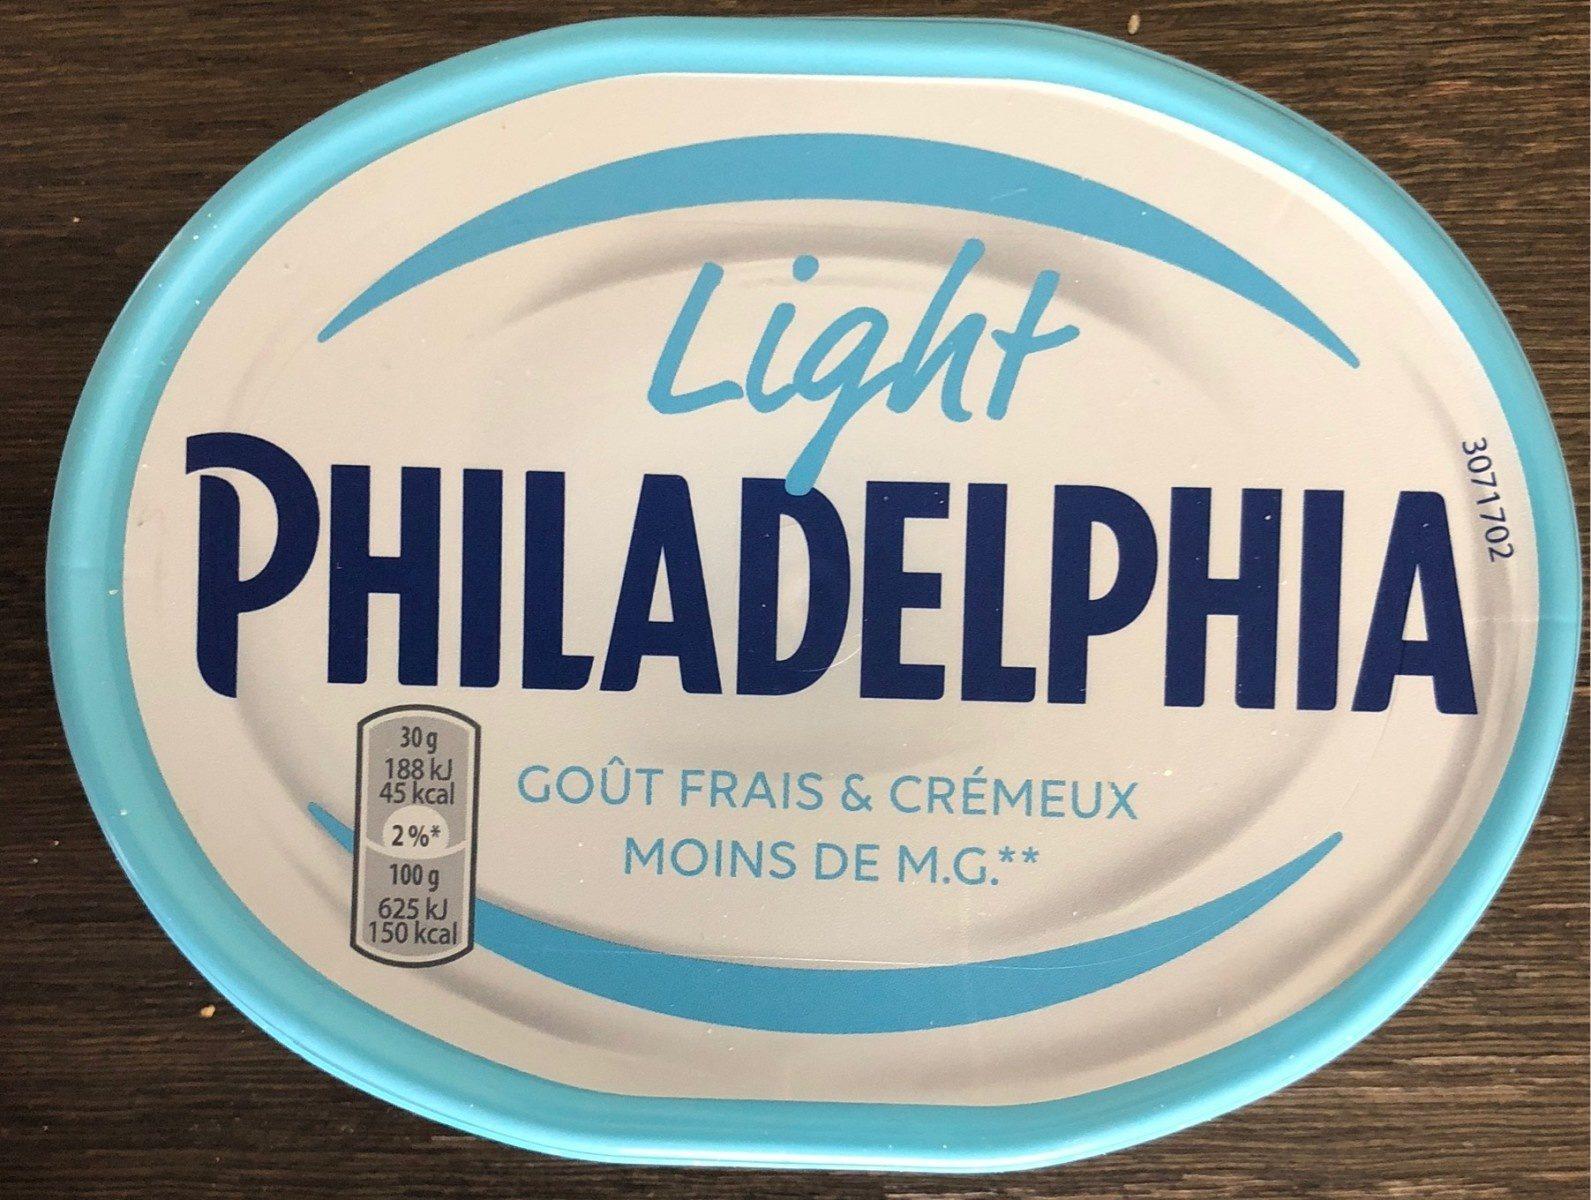 Philadelphia Light Nature (11,5% MG) - 150 g - Kraft - Produit